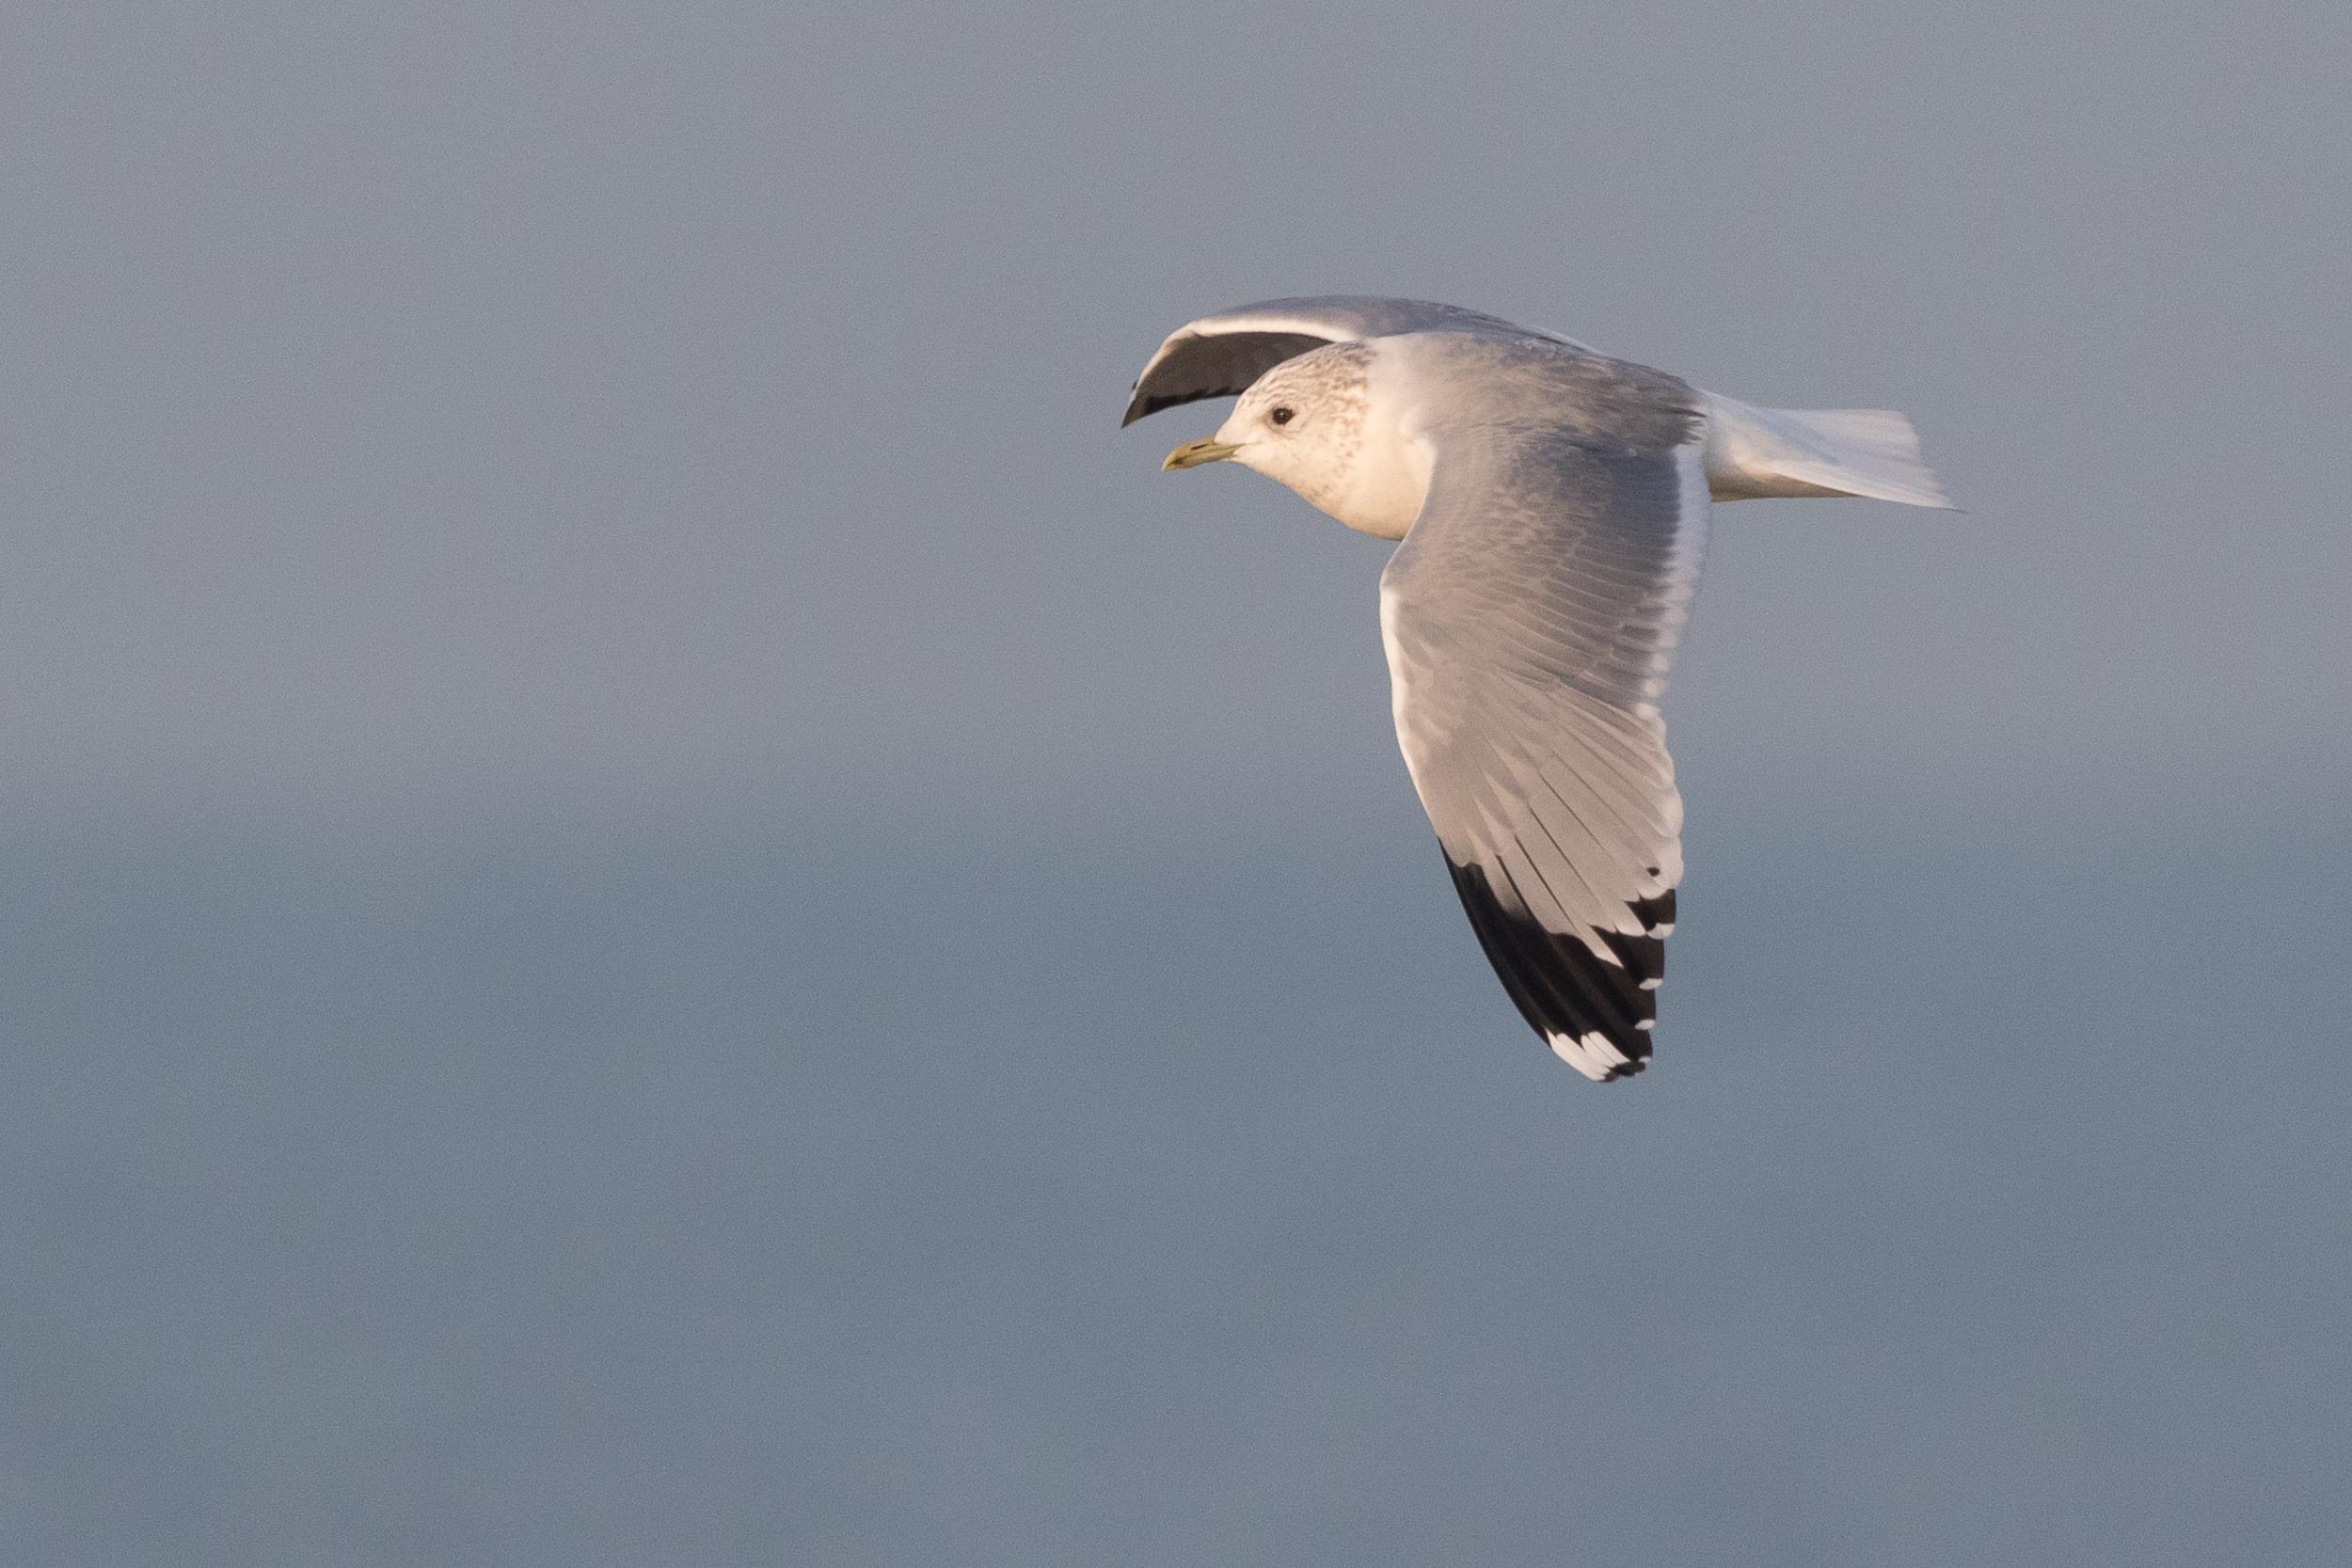 20170126-Common Gull Adult-142.jpg